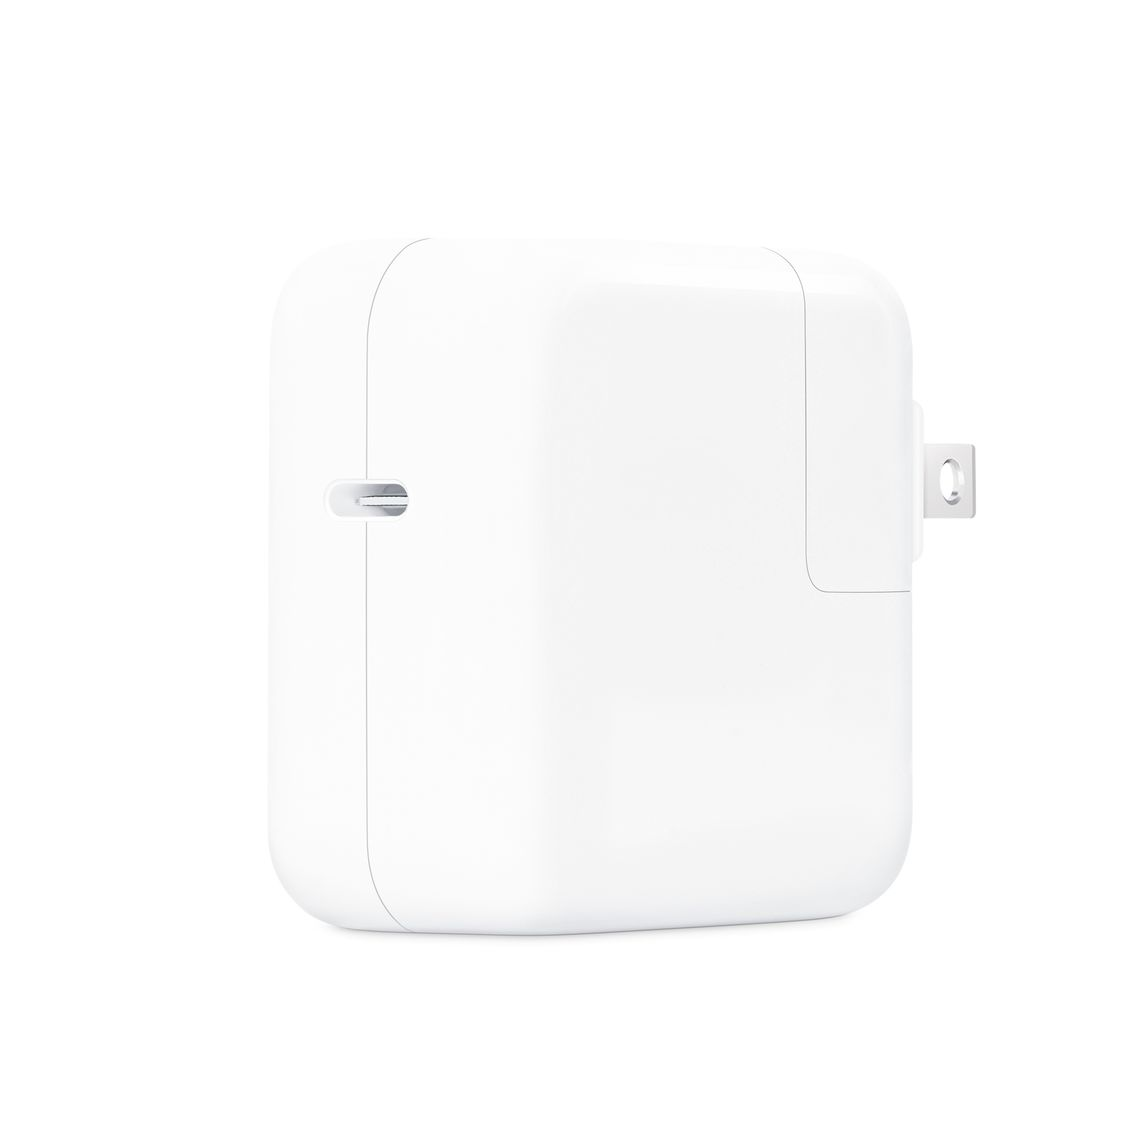 30w Usb C Power Adapter Apple